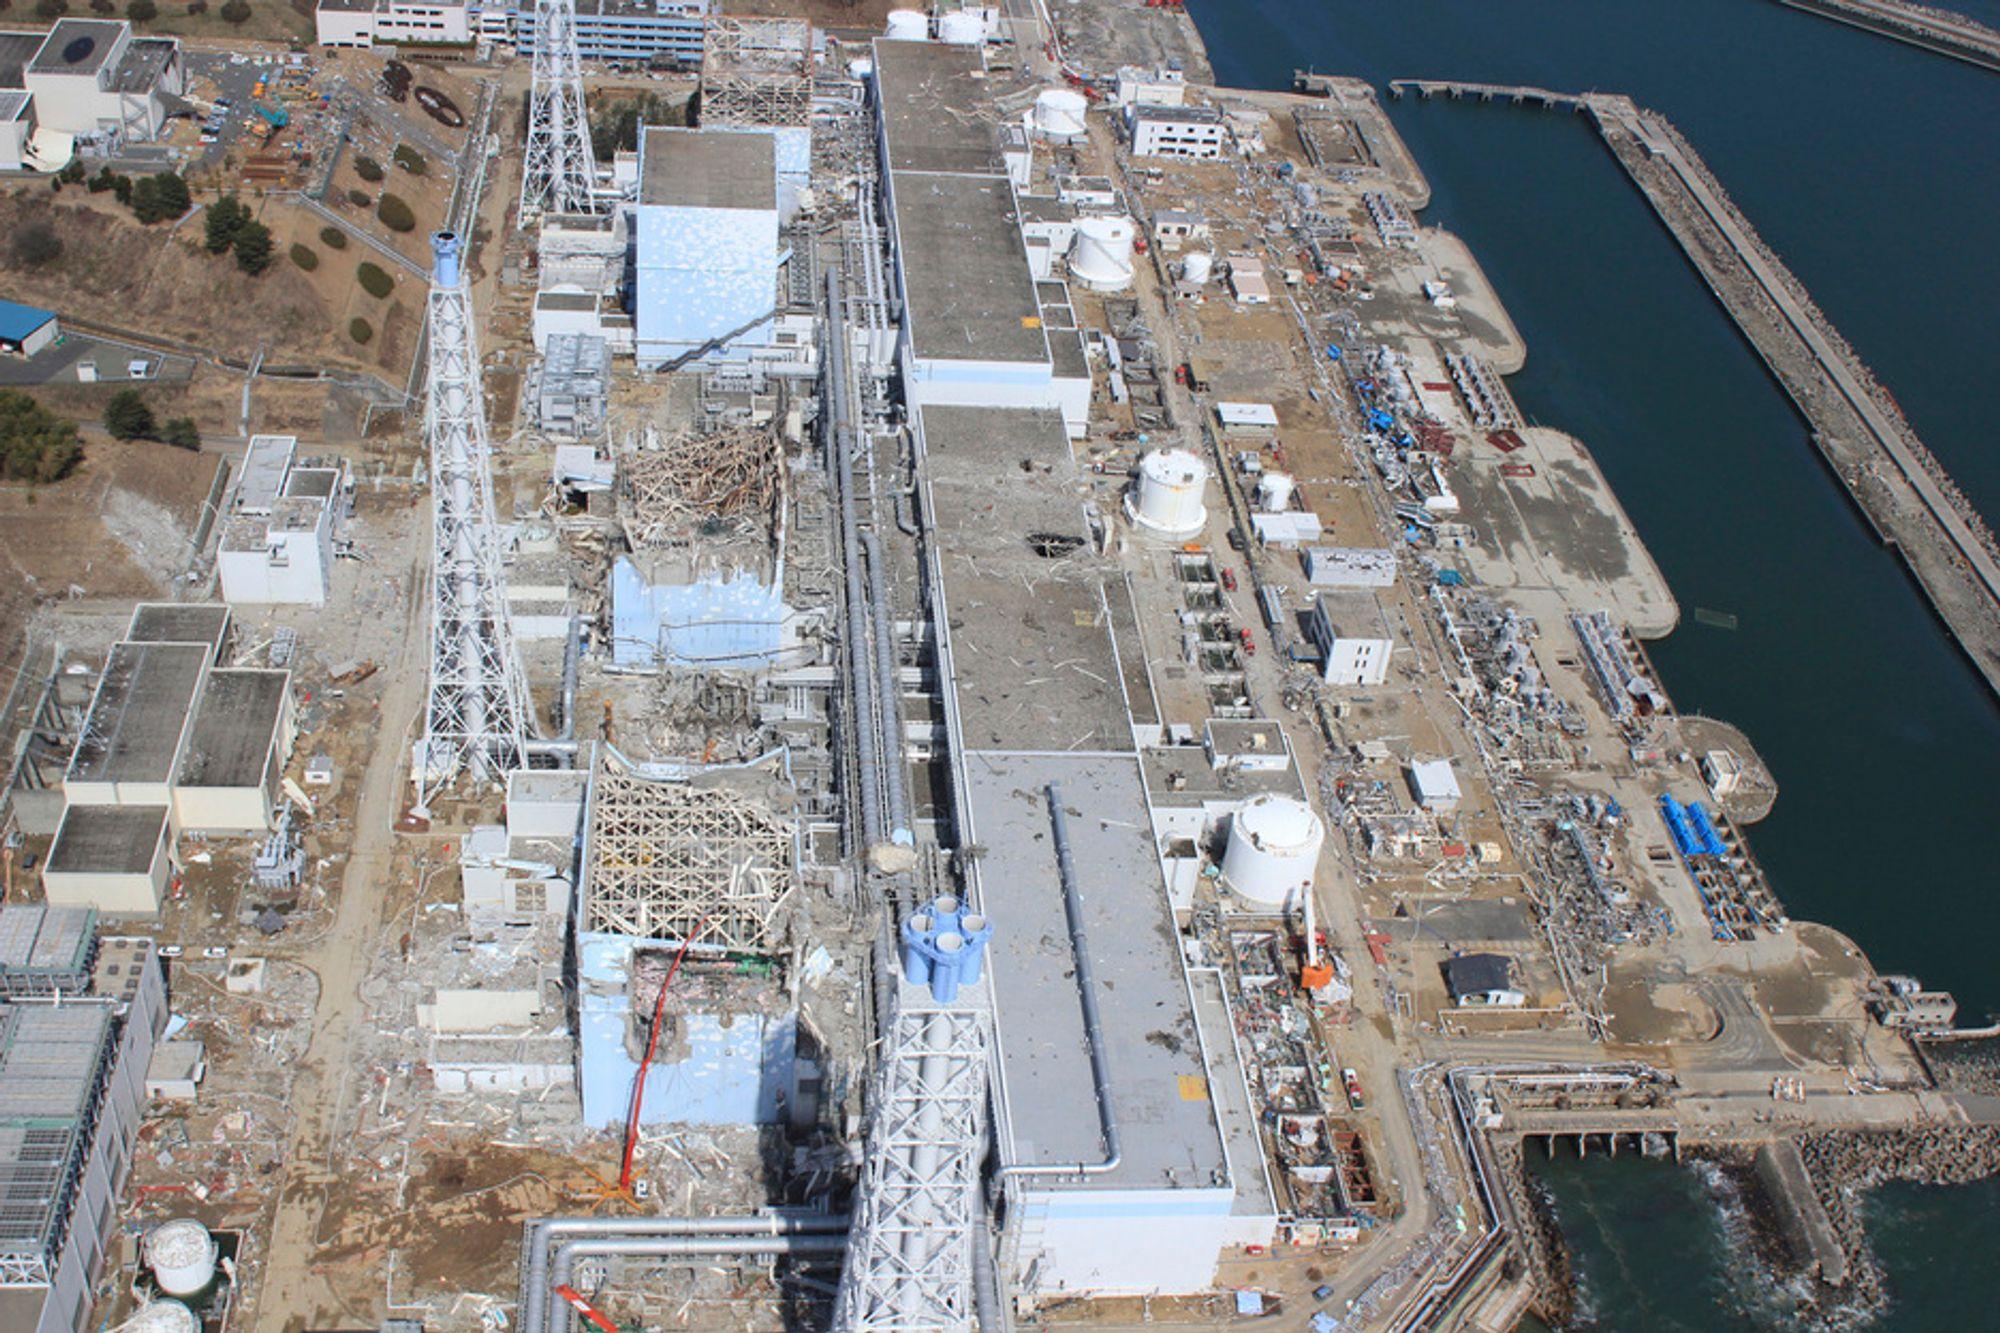 Luftfoto av atomkraftverket Fukushima Daiichi.